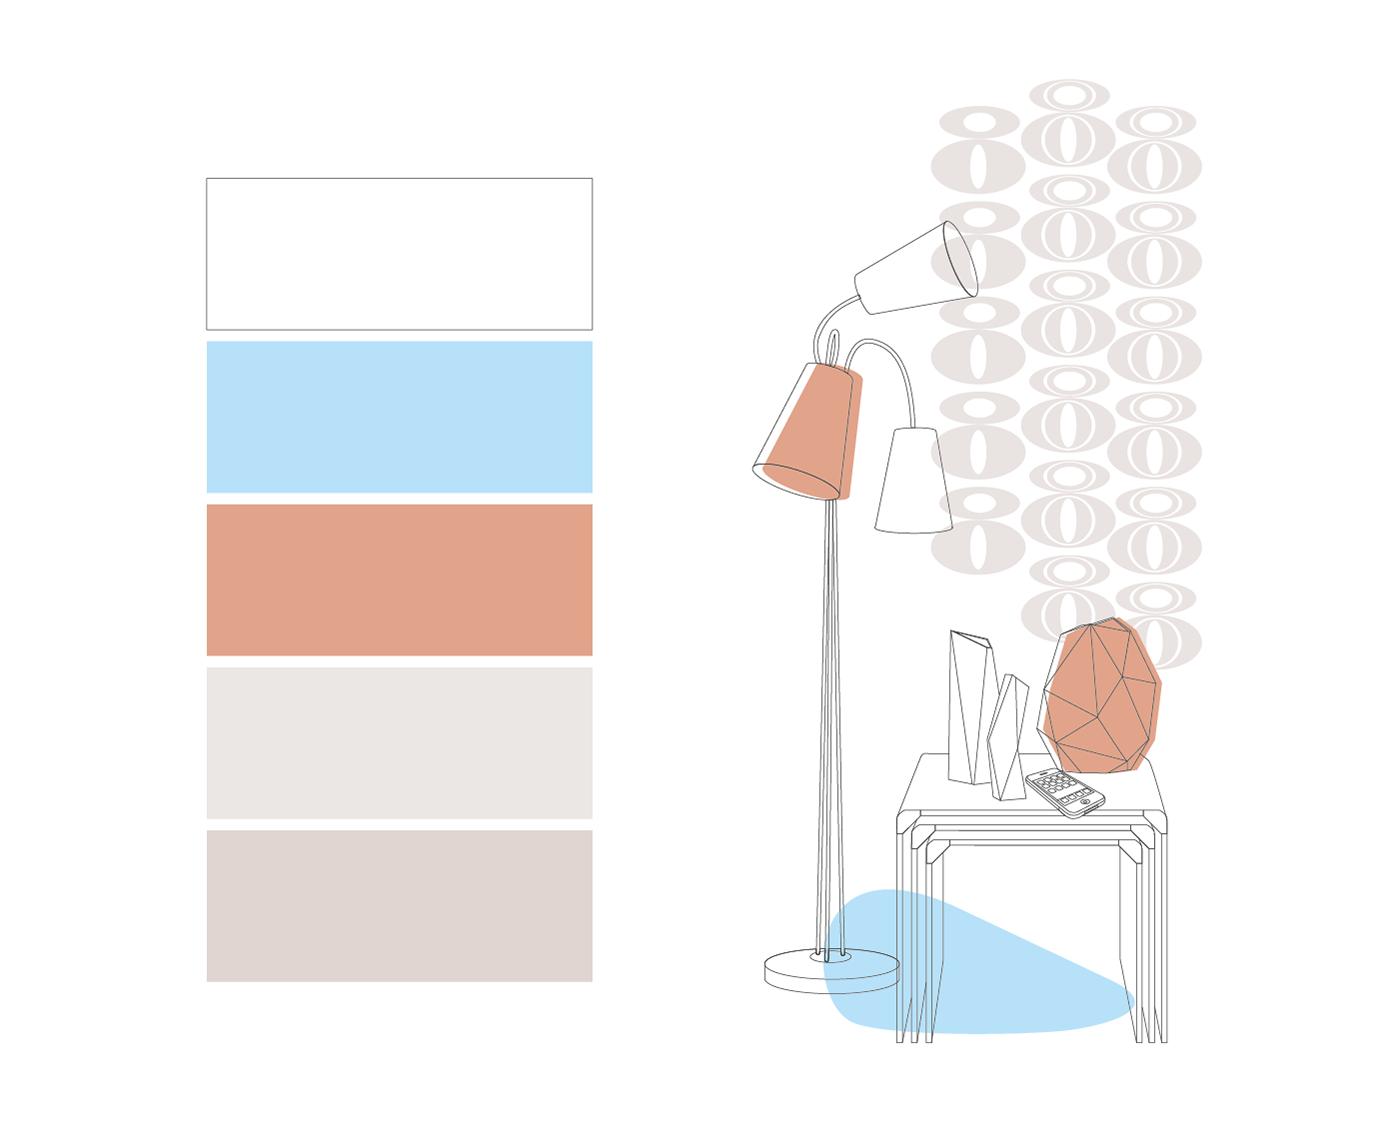 architecture architettura design Illustrator lifestyle Vectorial vettoriale